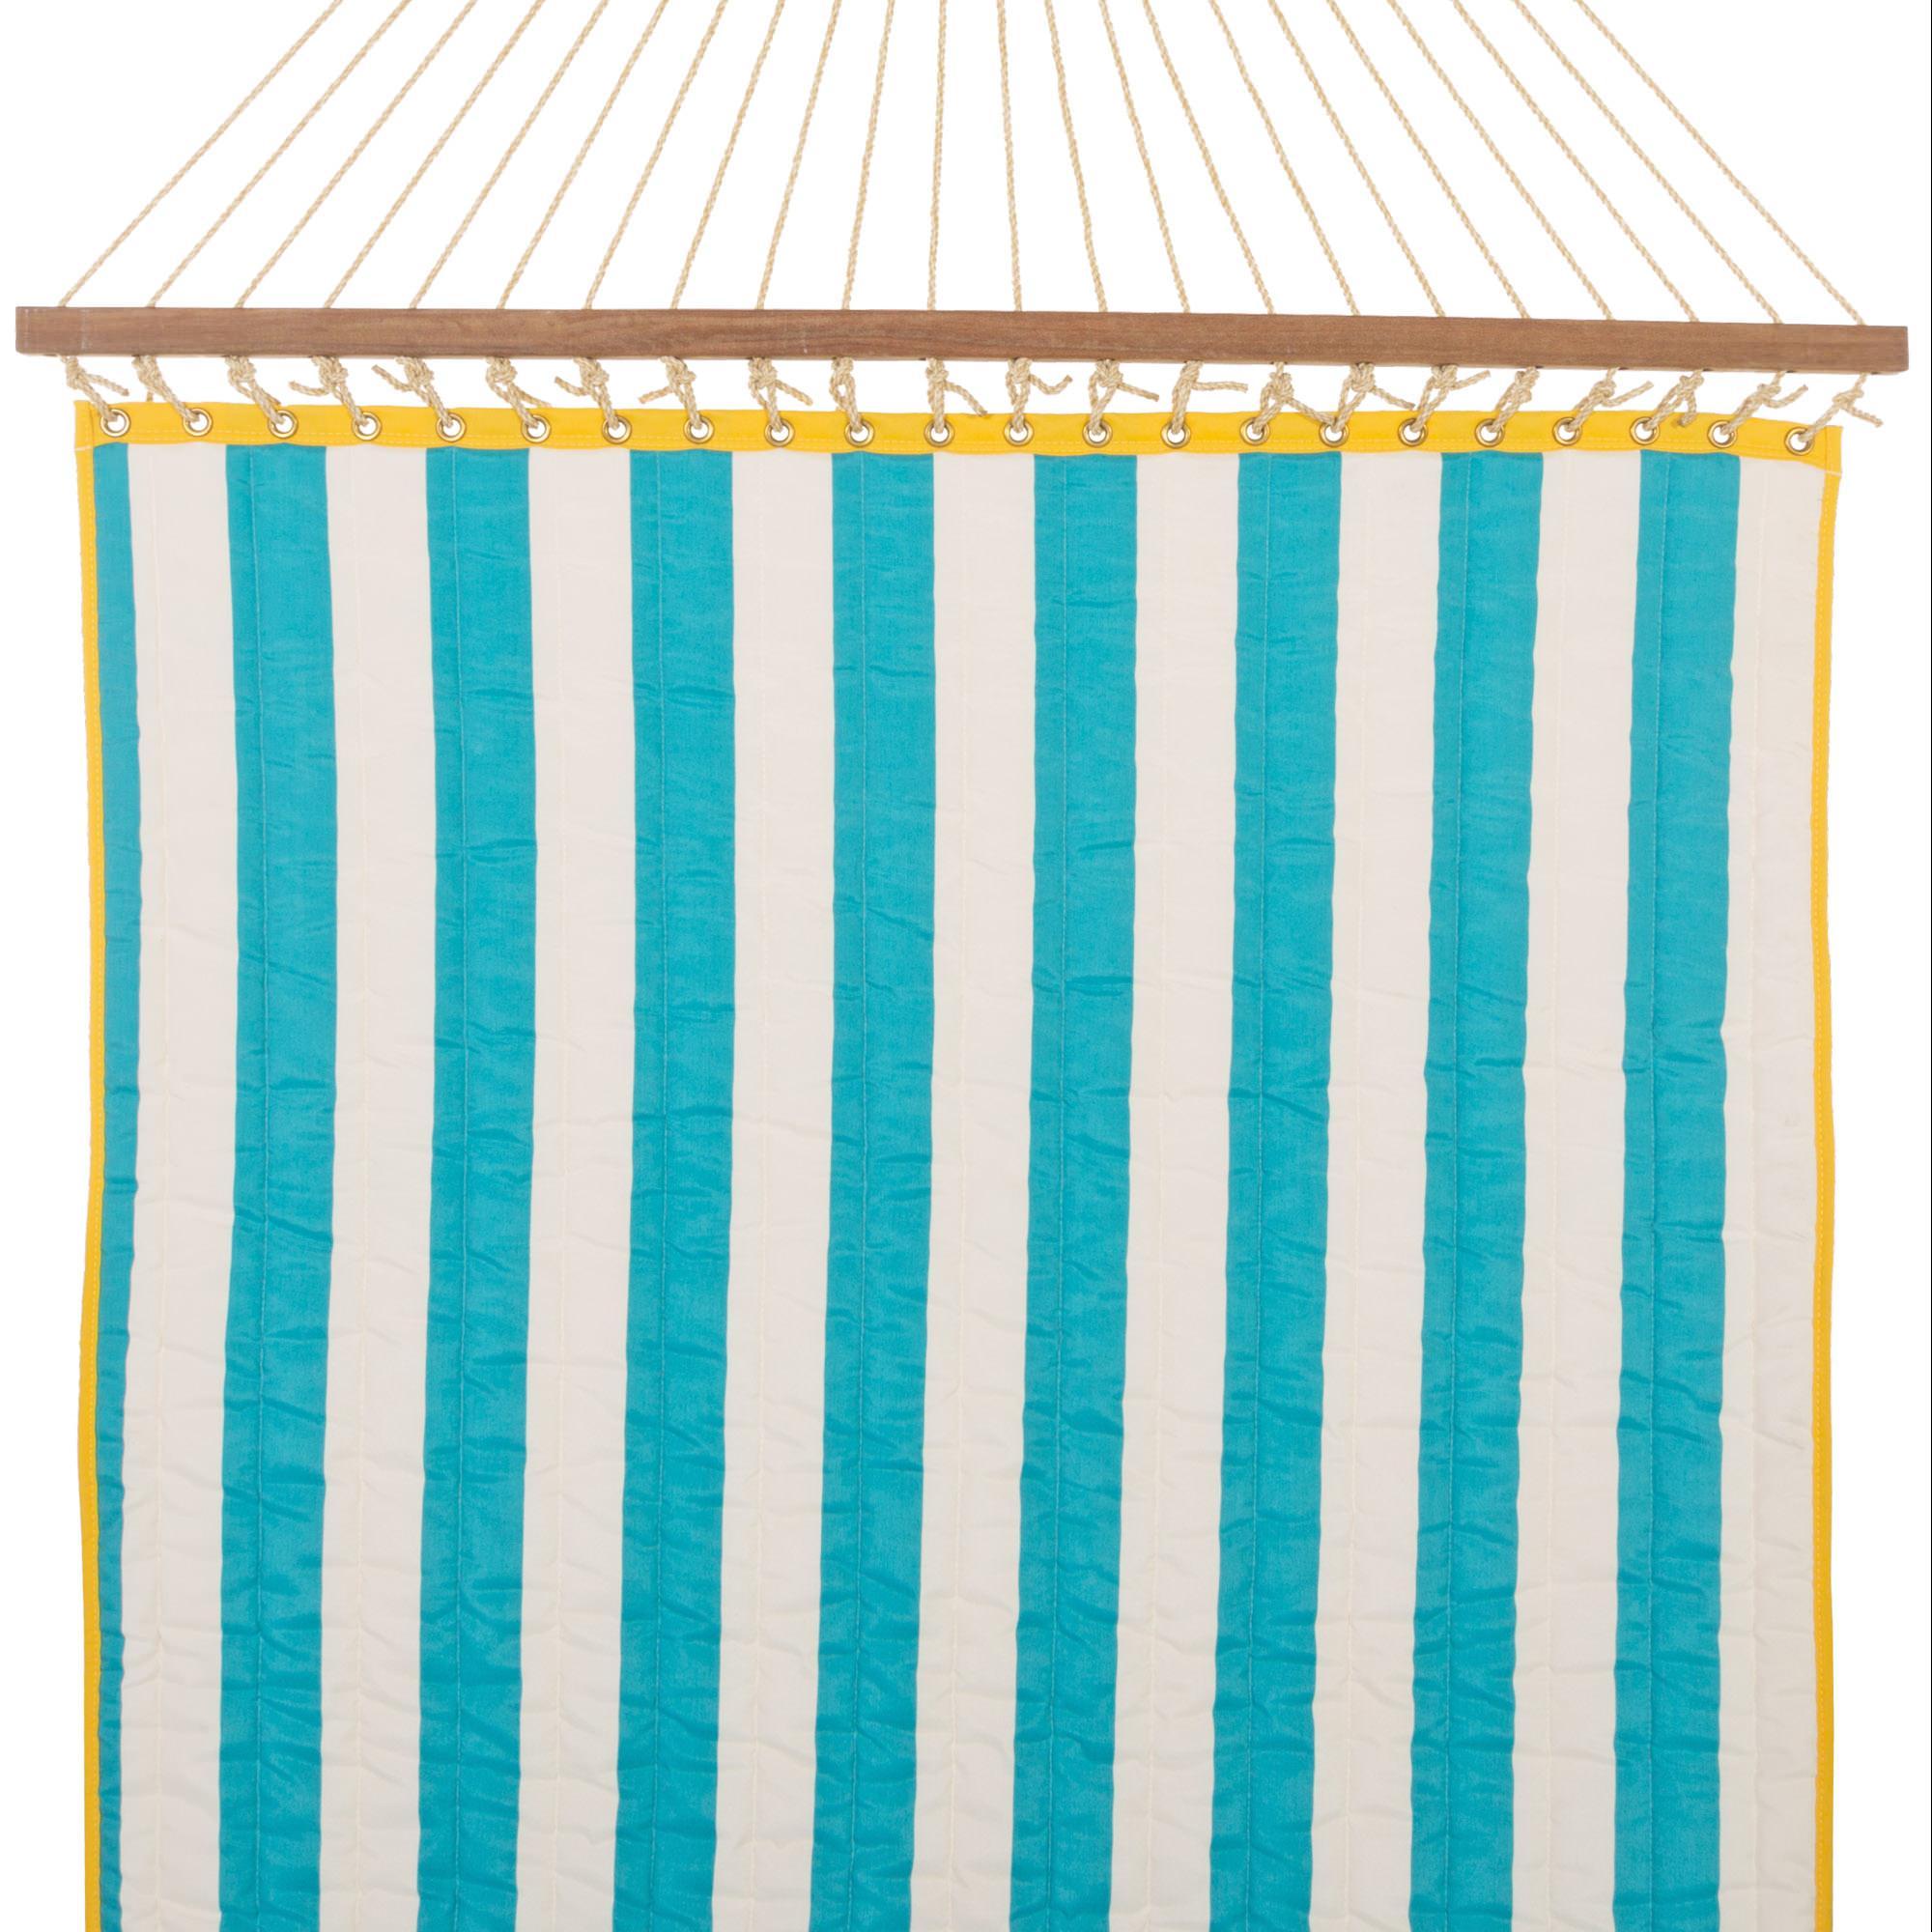 Turquoise Cabana Stripe Large Quilted Hammock